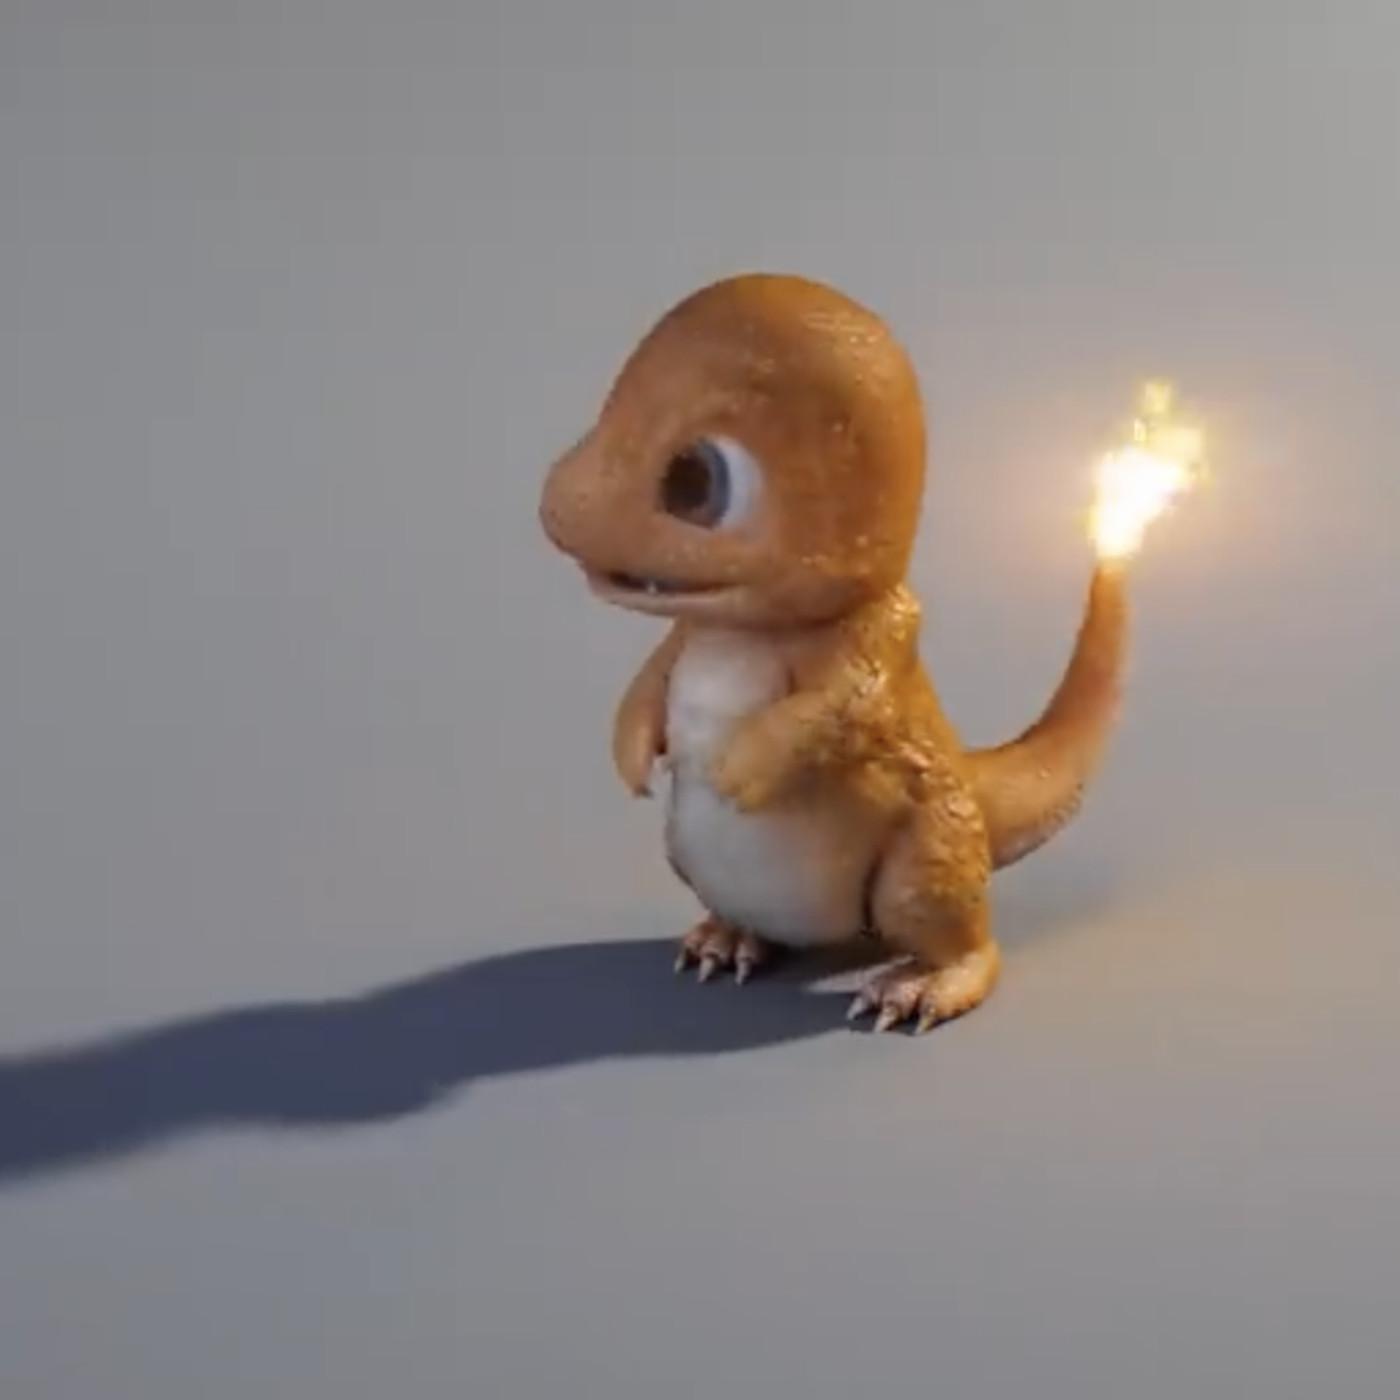 Detective pikachu casting video is chock full of wonderful pokémon polygon